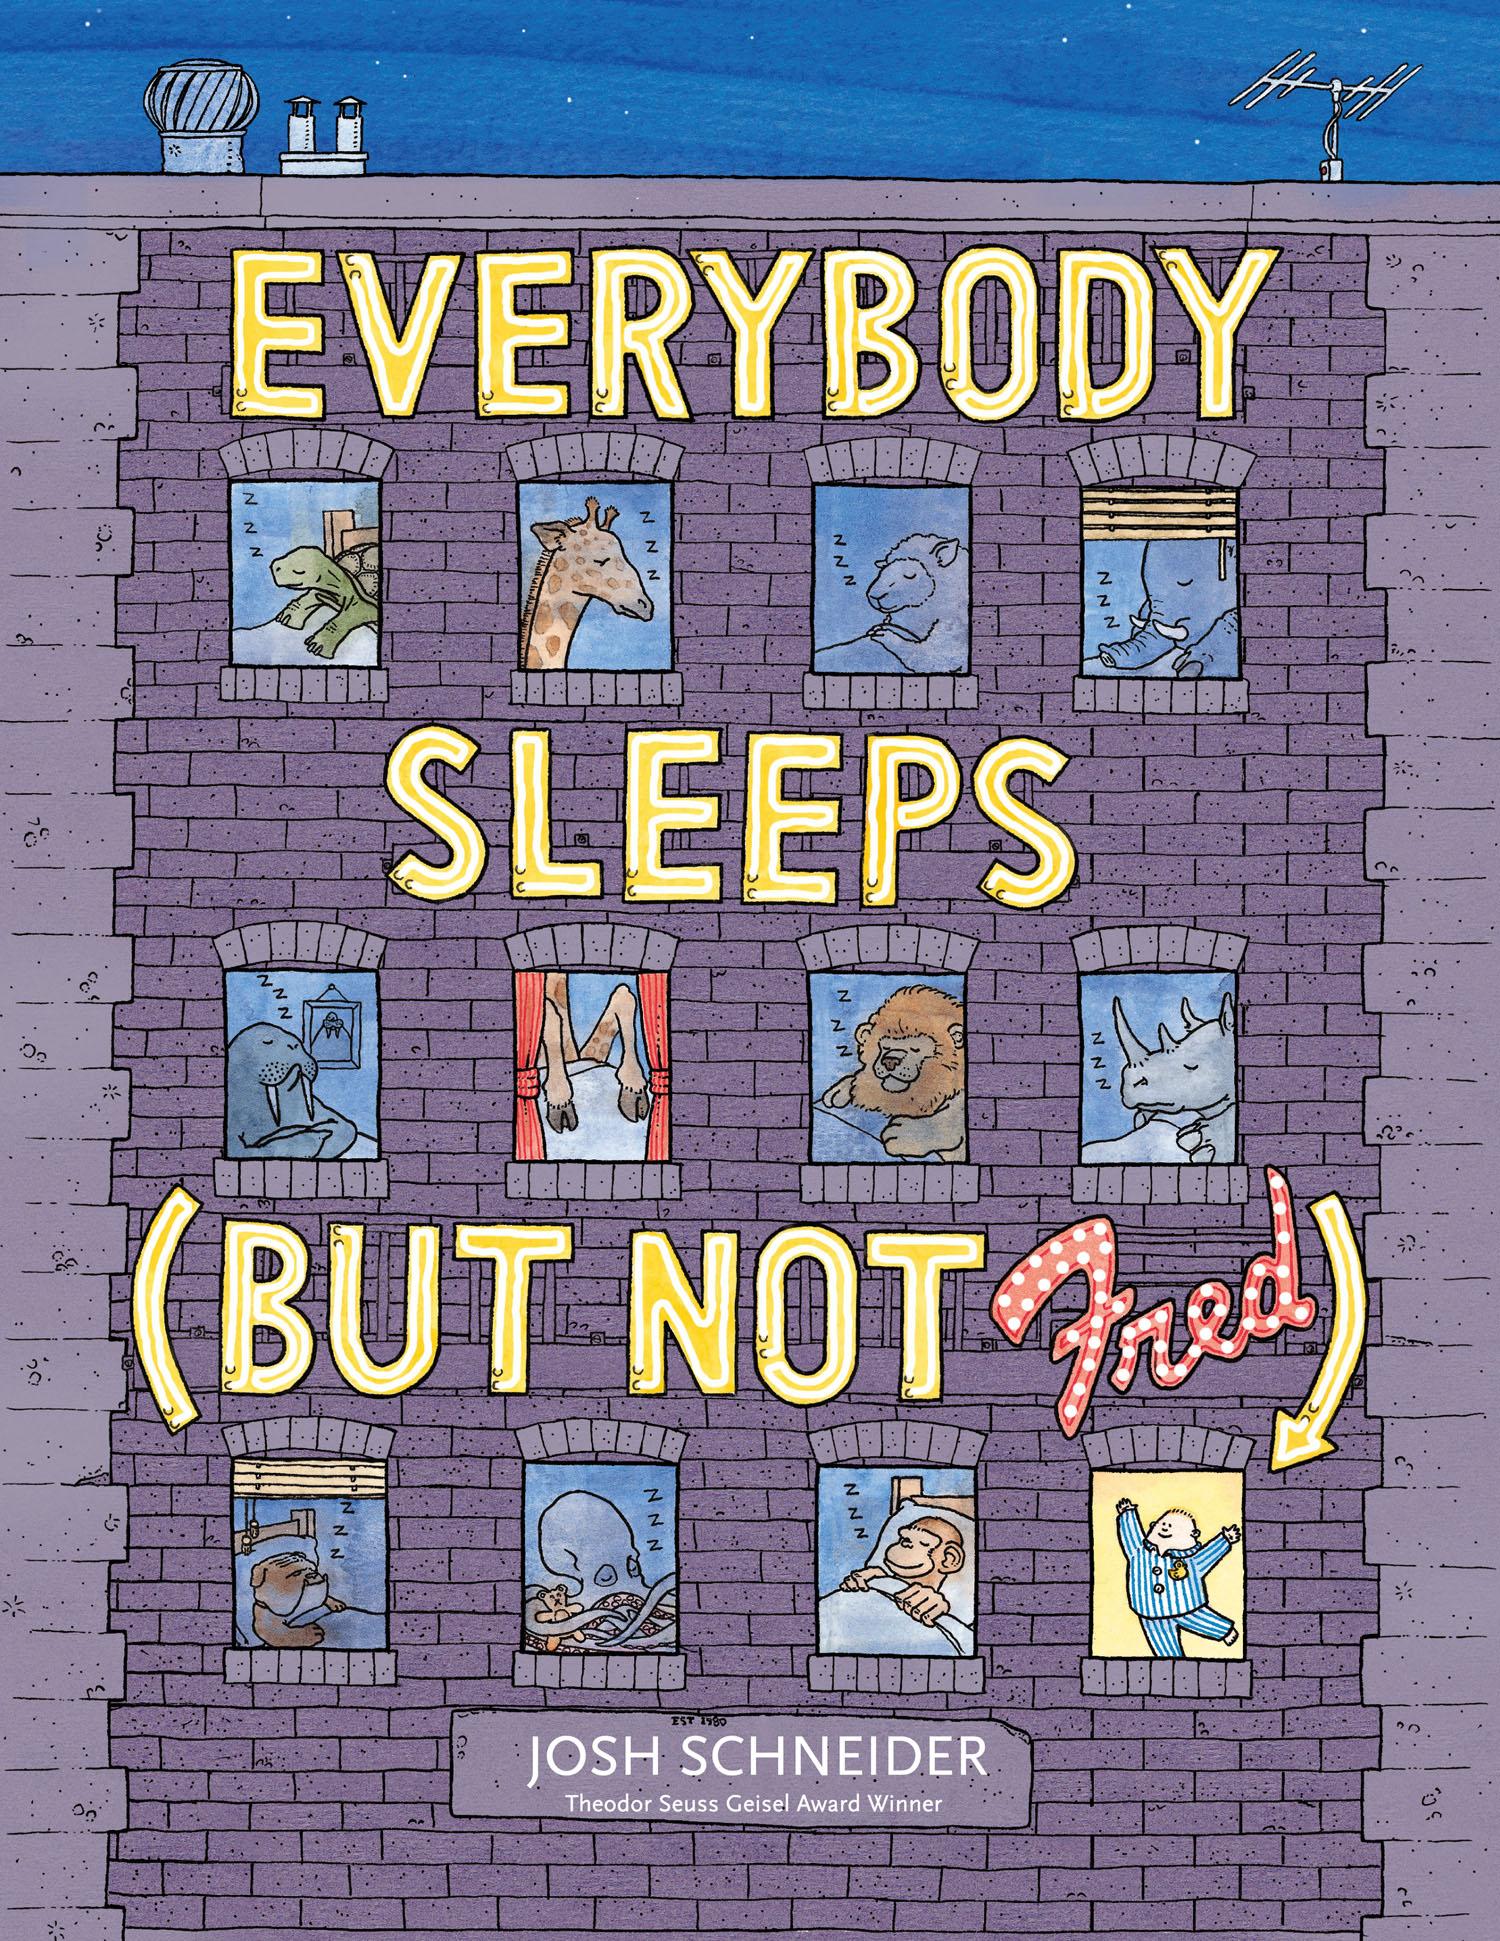 Schneider, Josh 2015_04 - EVERYBODY SLEEPS (BUT NOT FRED) - PB - RLM PR.jpg